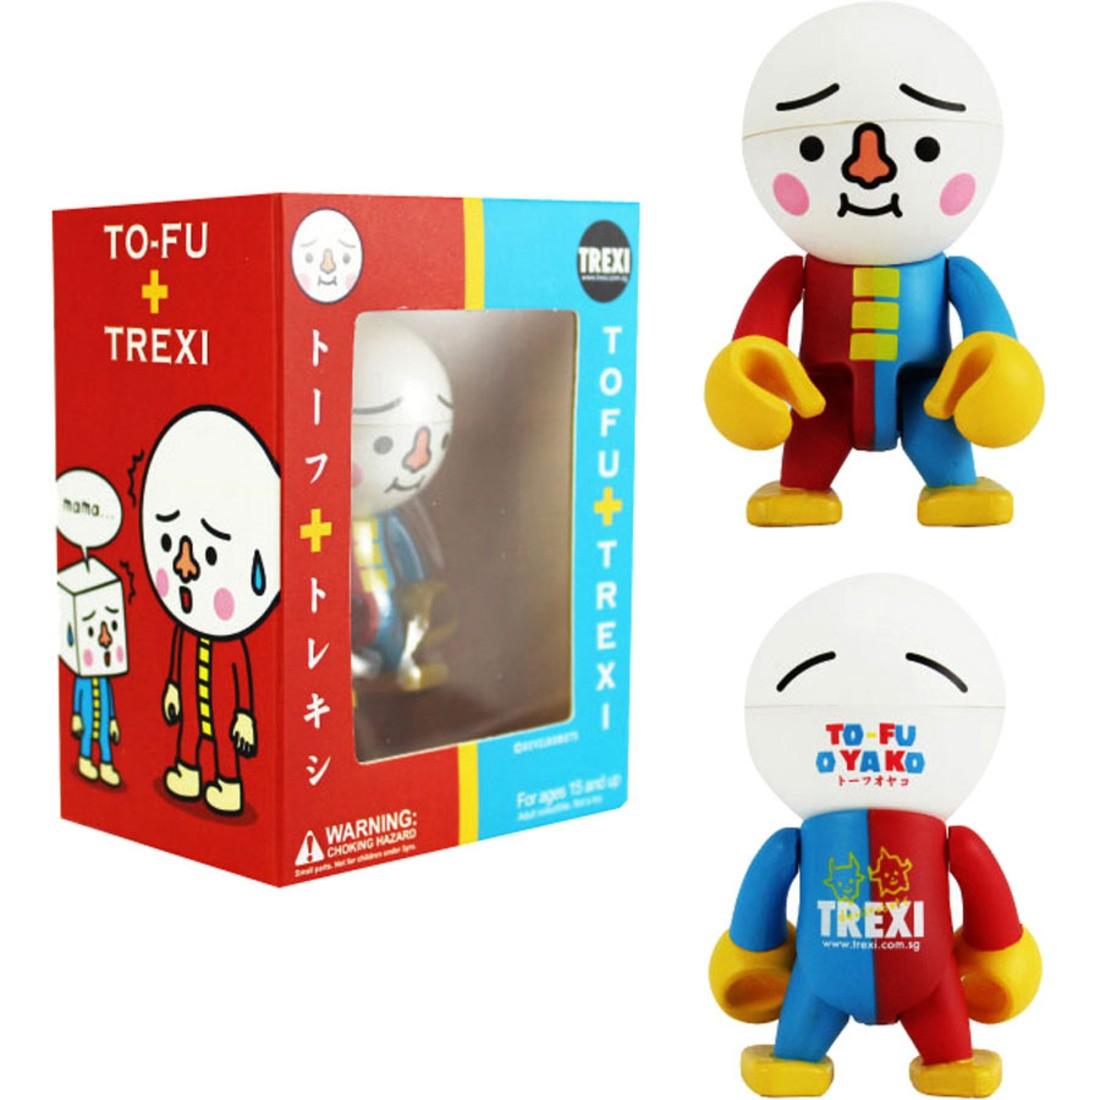 red // blue To-Fu Tofu Oyako 2.5 Inch Trexi Figure